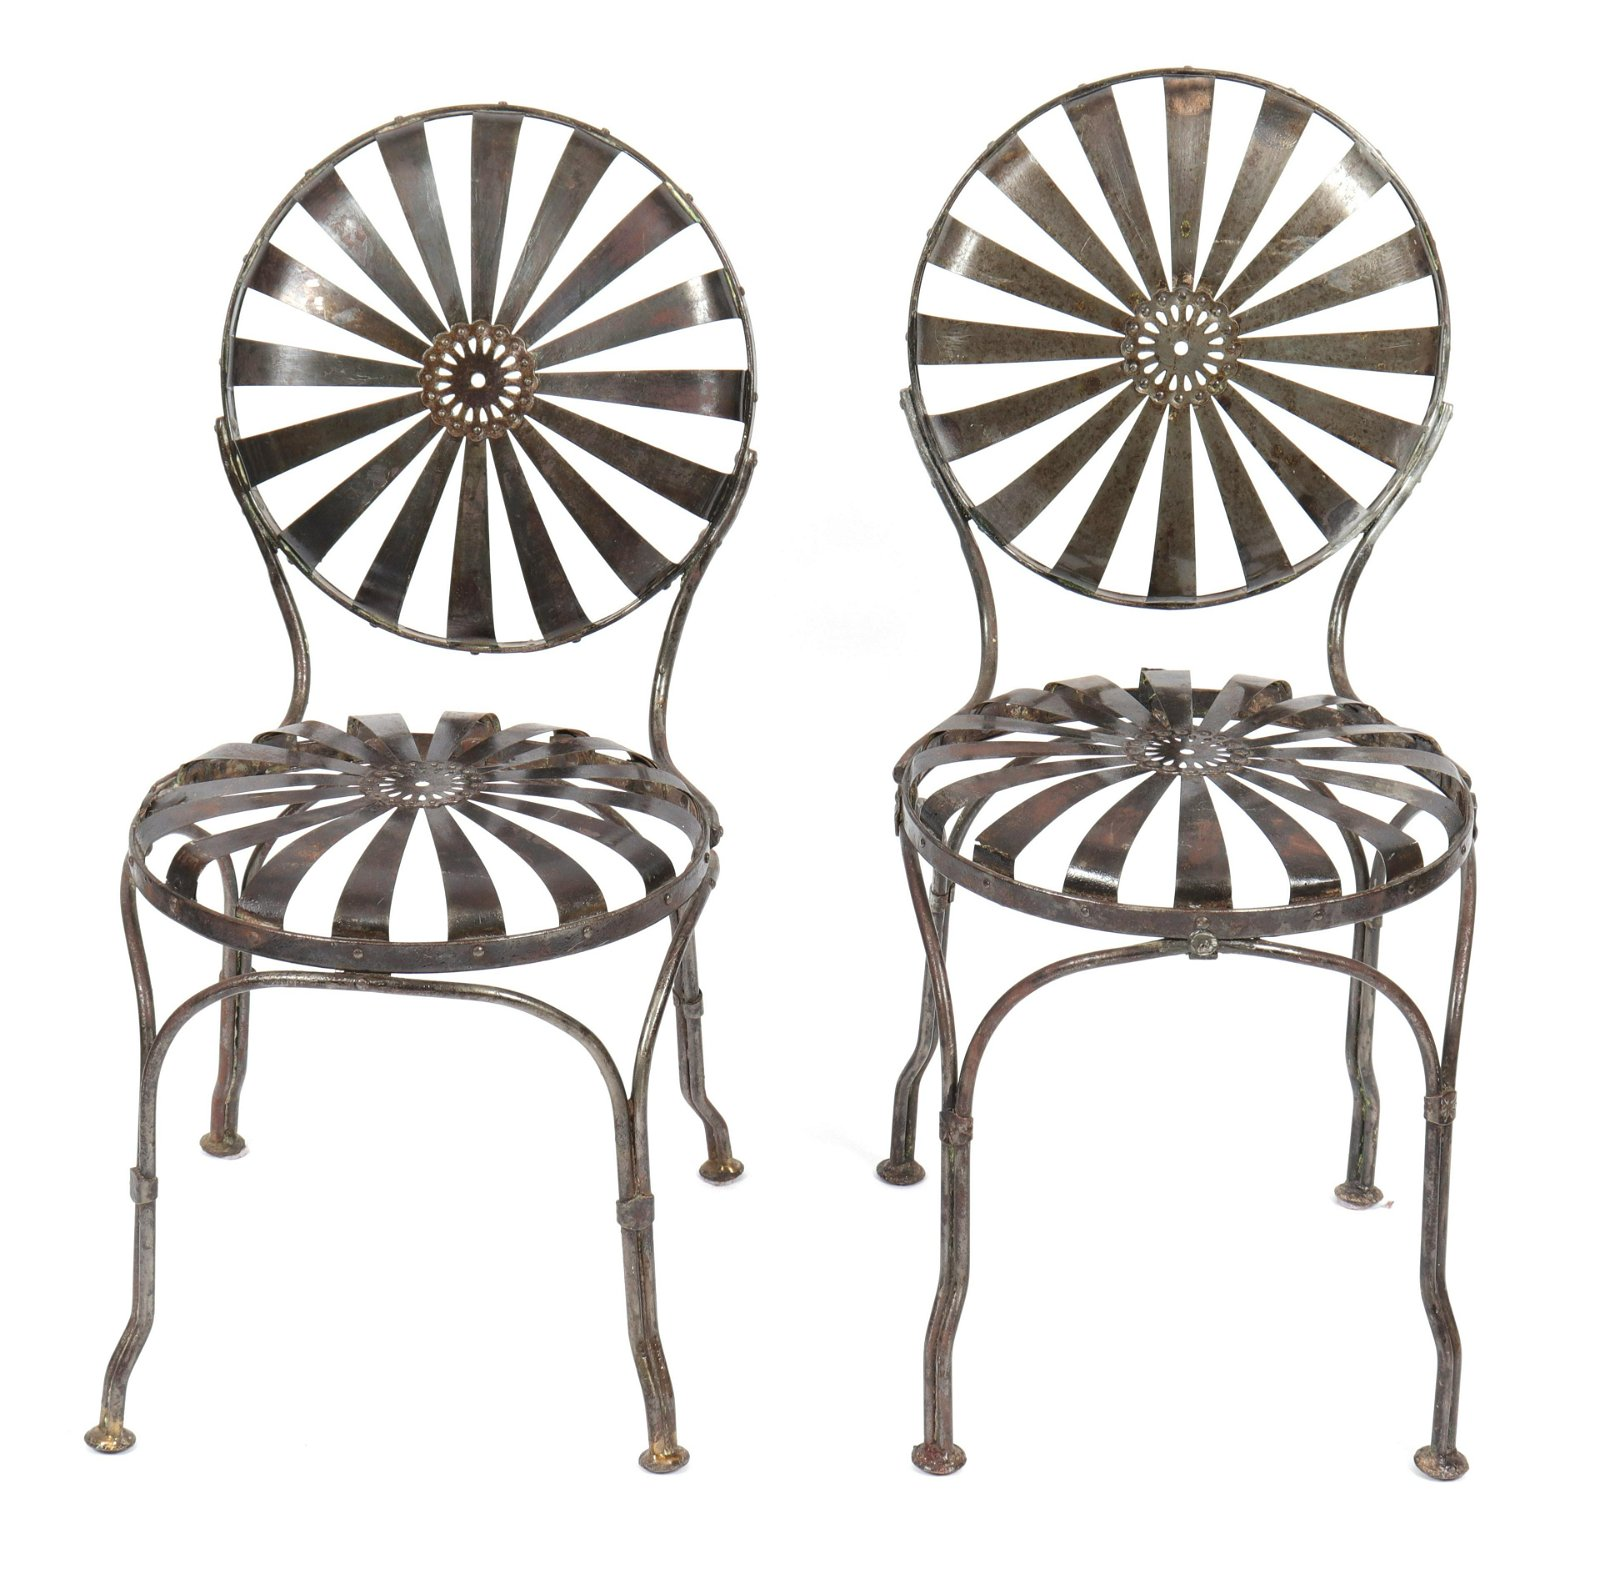 "Francois Carre Steel ""Sunburst"" Side Chairs, Pair"